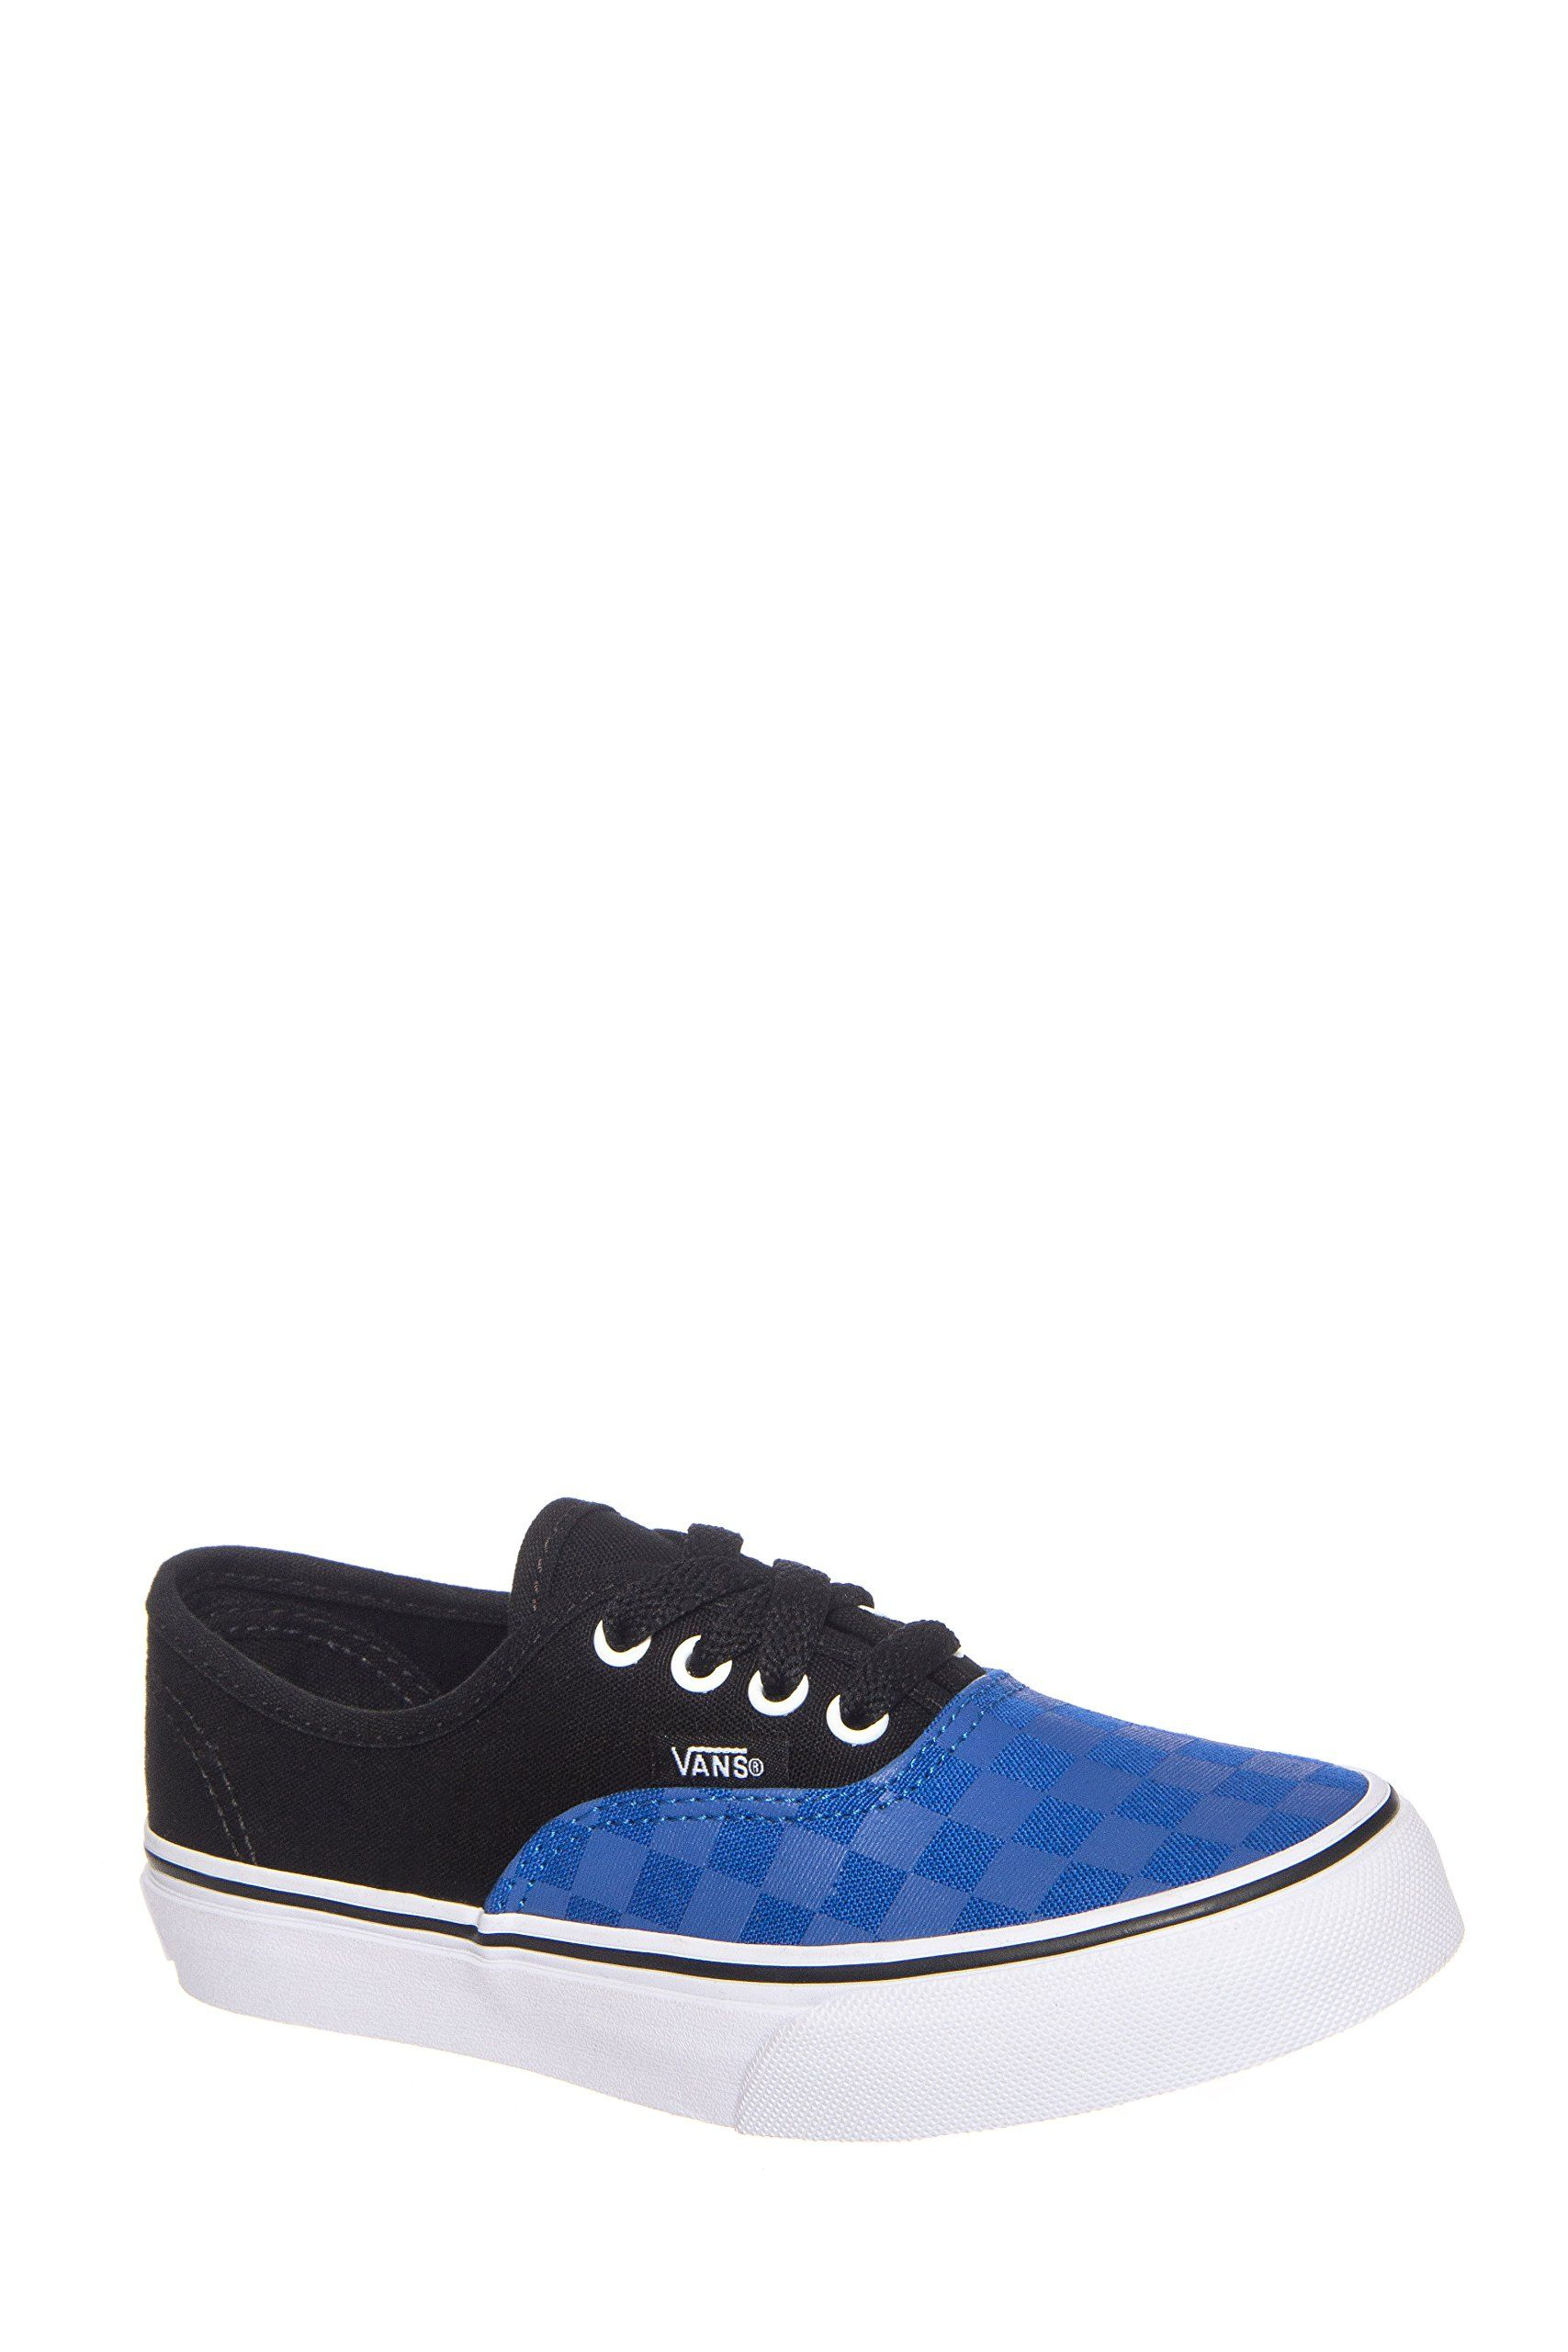 Skate shoes kingston - Vans Kids Tonal Checker Authentic Boys Skateboarding Shoes Vn 018rgxl_13 5 Olympian